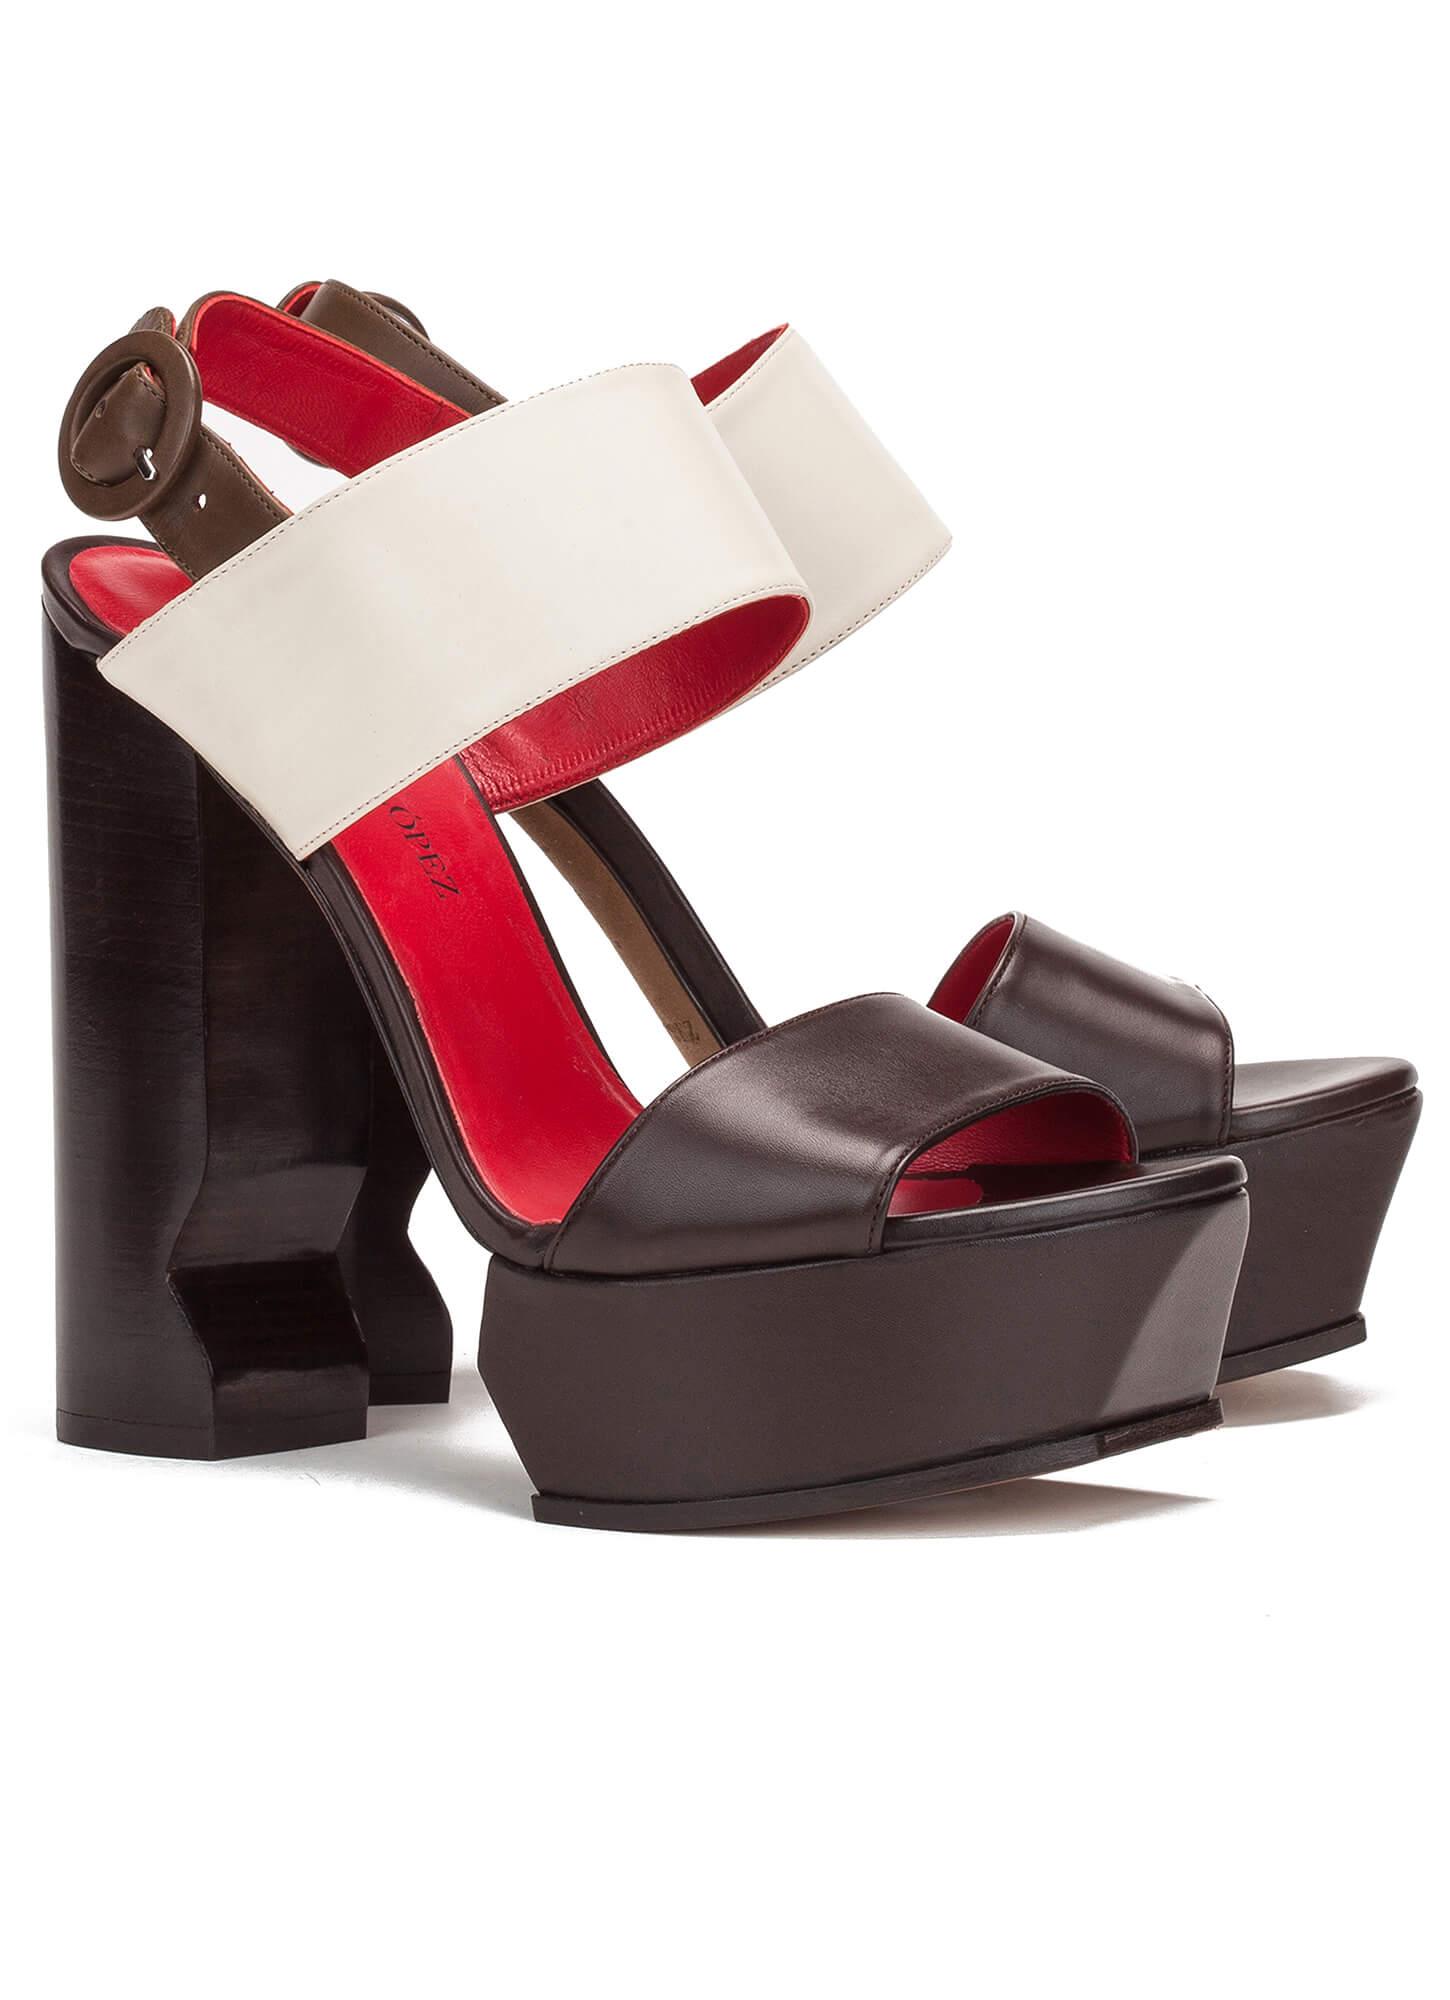 42beb84269a2 ... Brown and cream platform sandals - shoe store Pura López Karri Pura  López ...